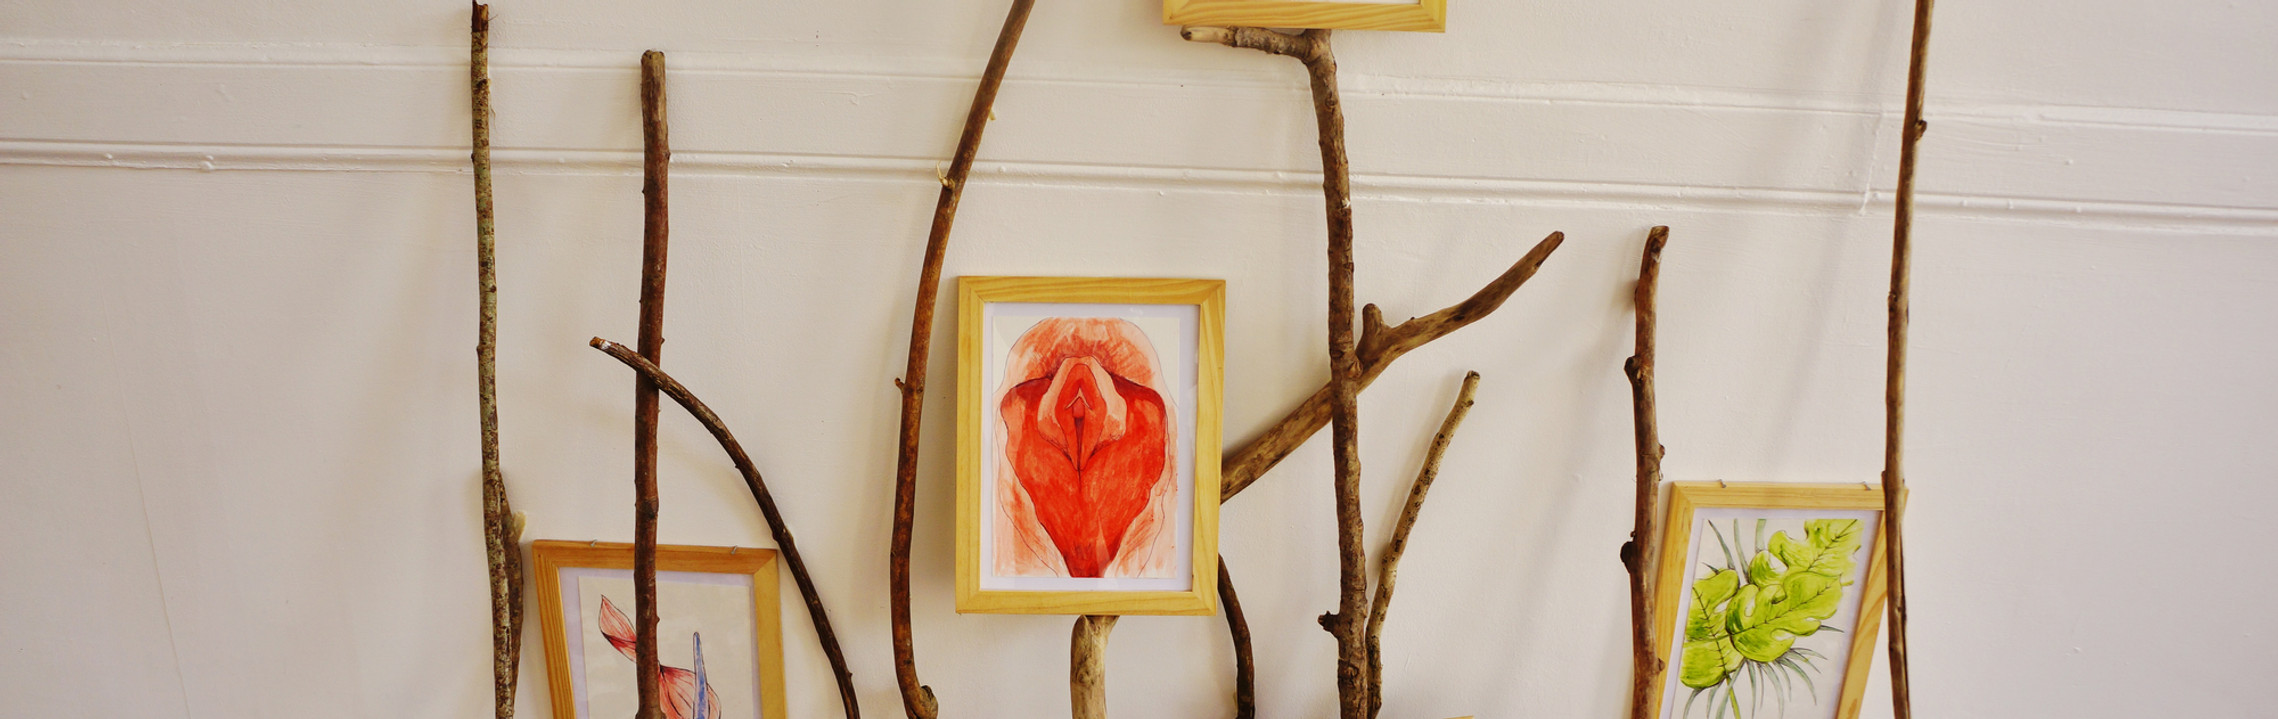 """Fleurs anatomiques"", aquarelles, 2019"